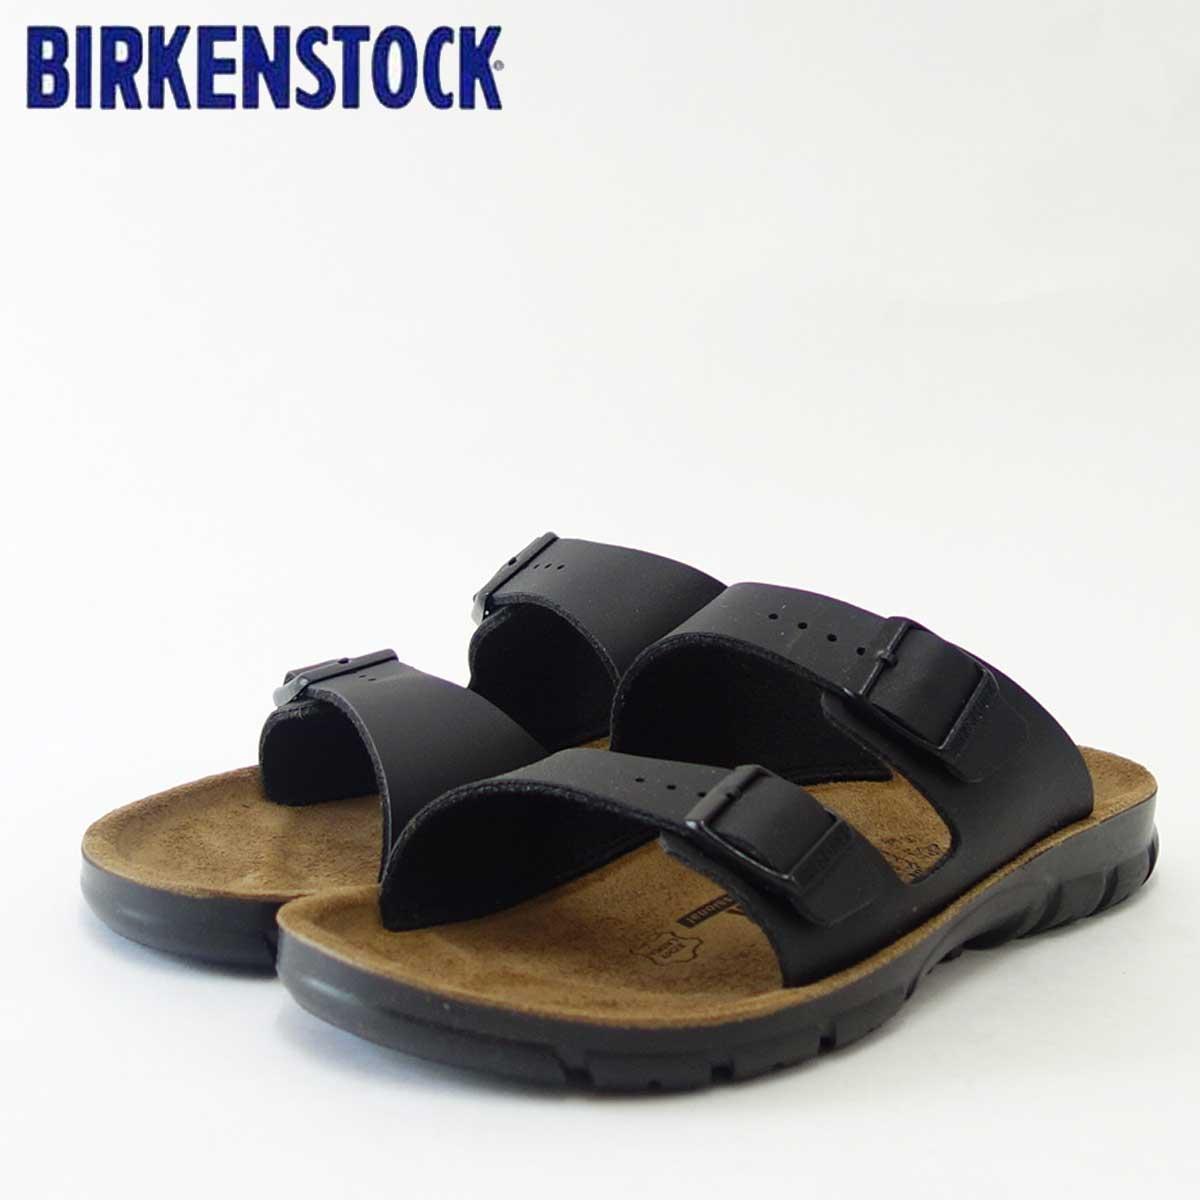 hot products top fashion nice cheap Professional player regular article ビルケンシュトック BIRKENSTOCK professional  Bilbao Bilbao 520791 black (men's) shock absorption heel pad